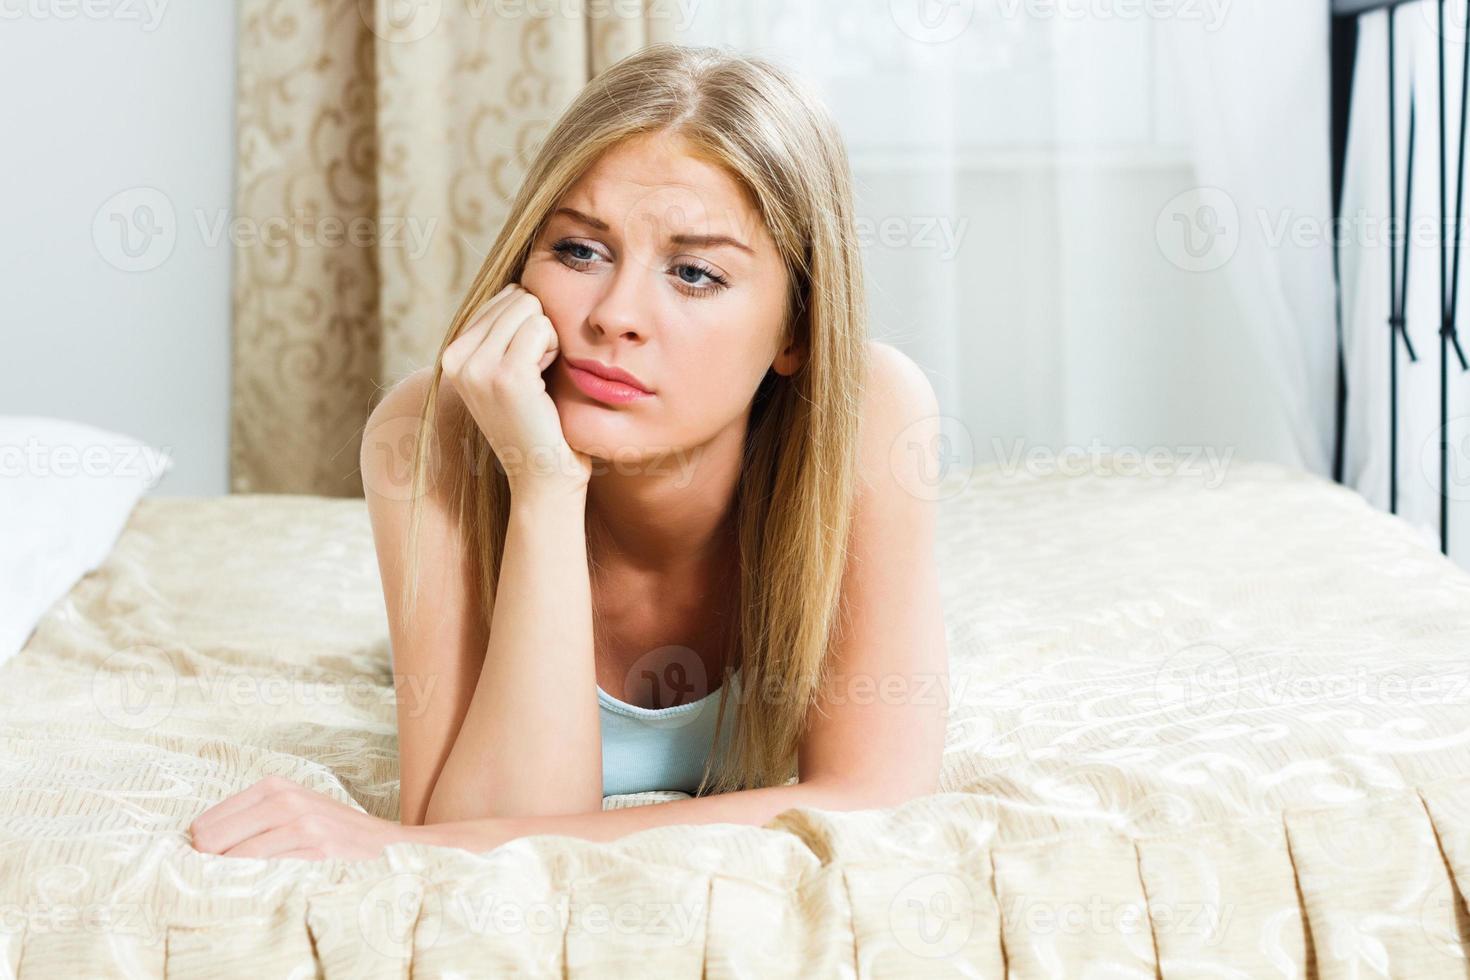 femme triste photo